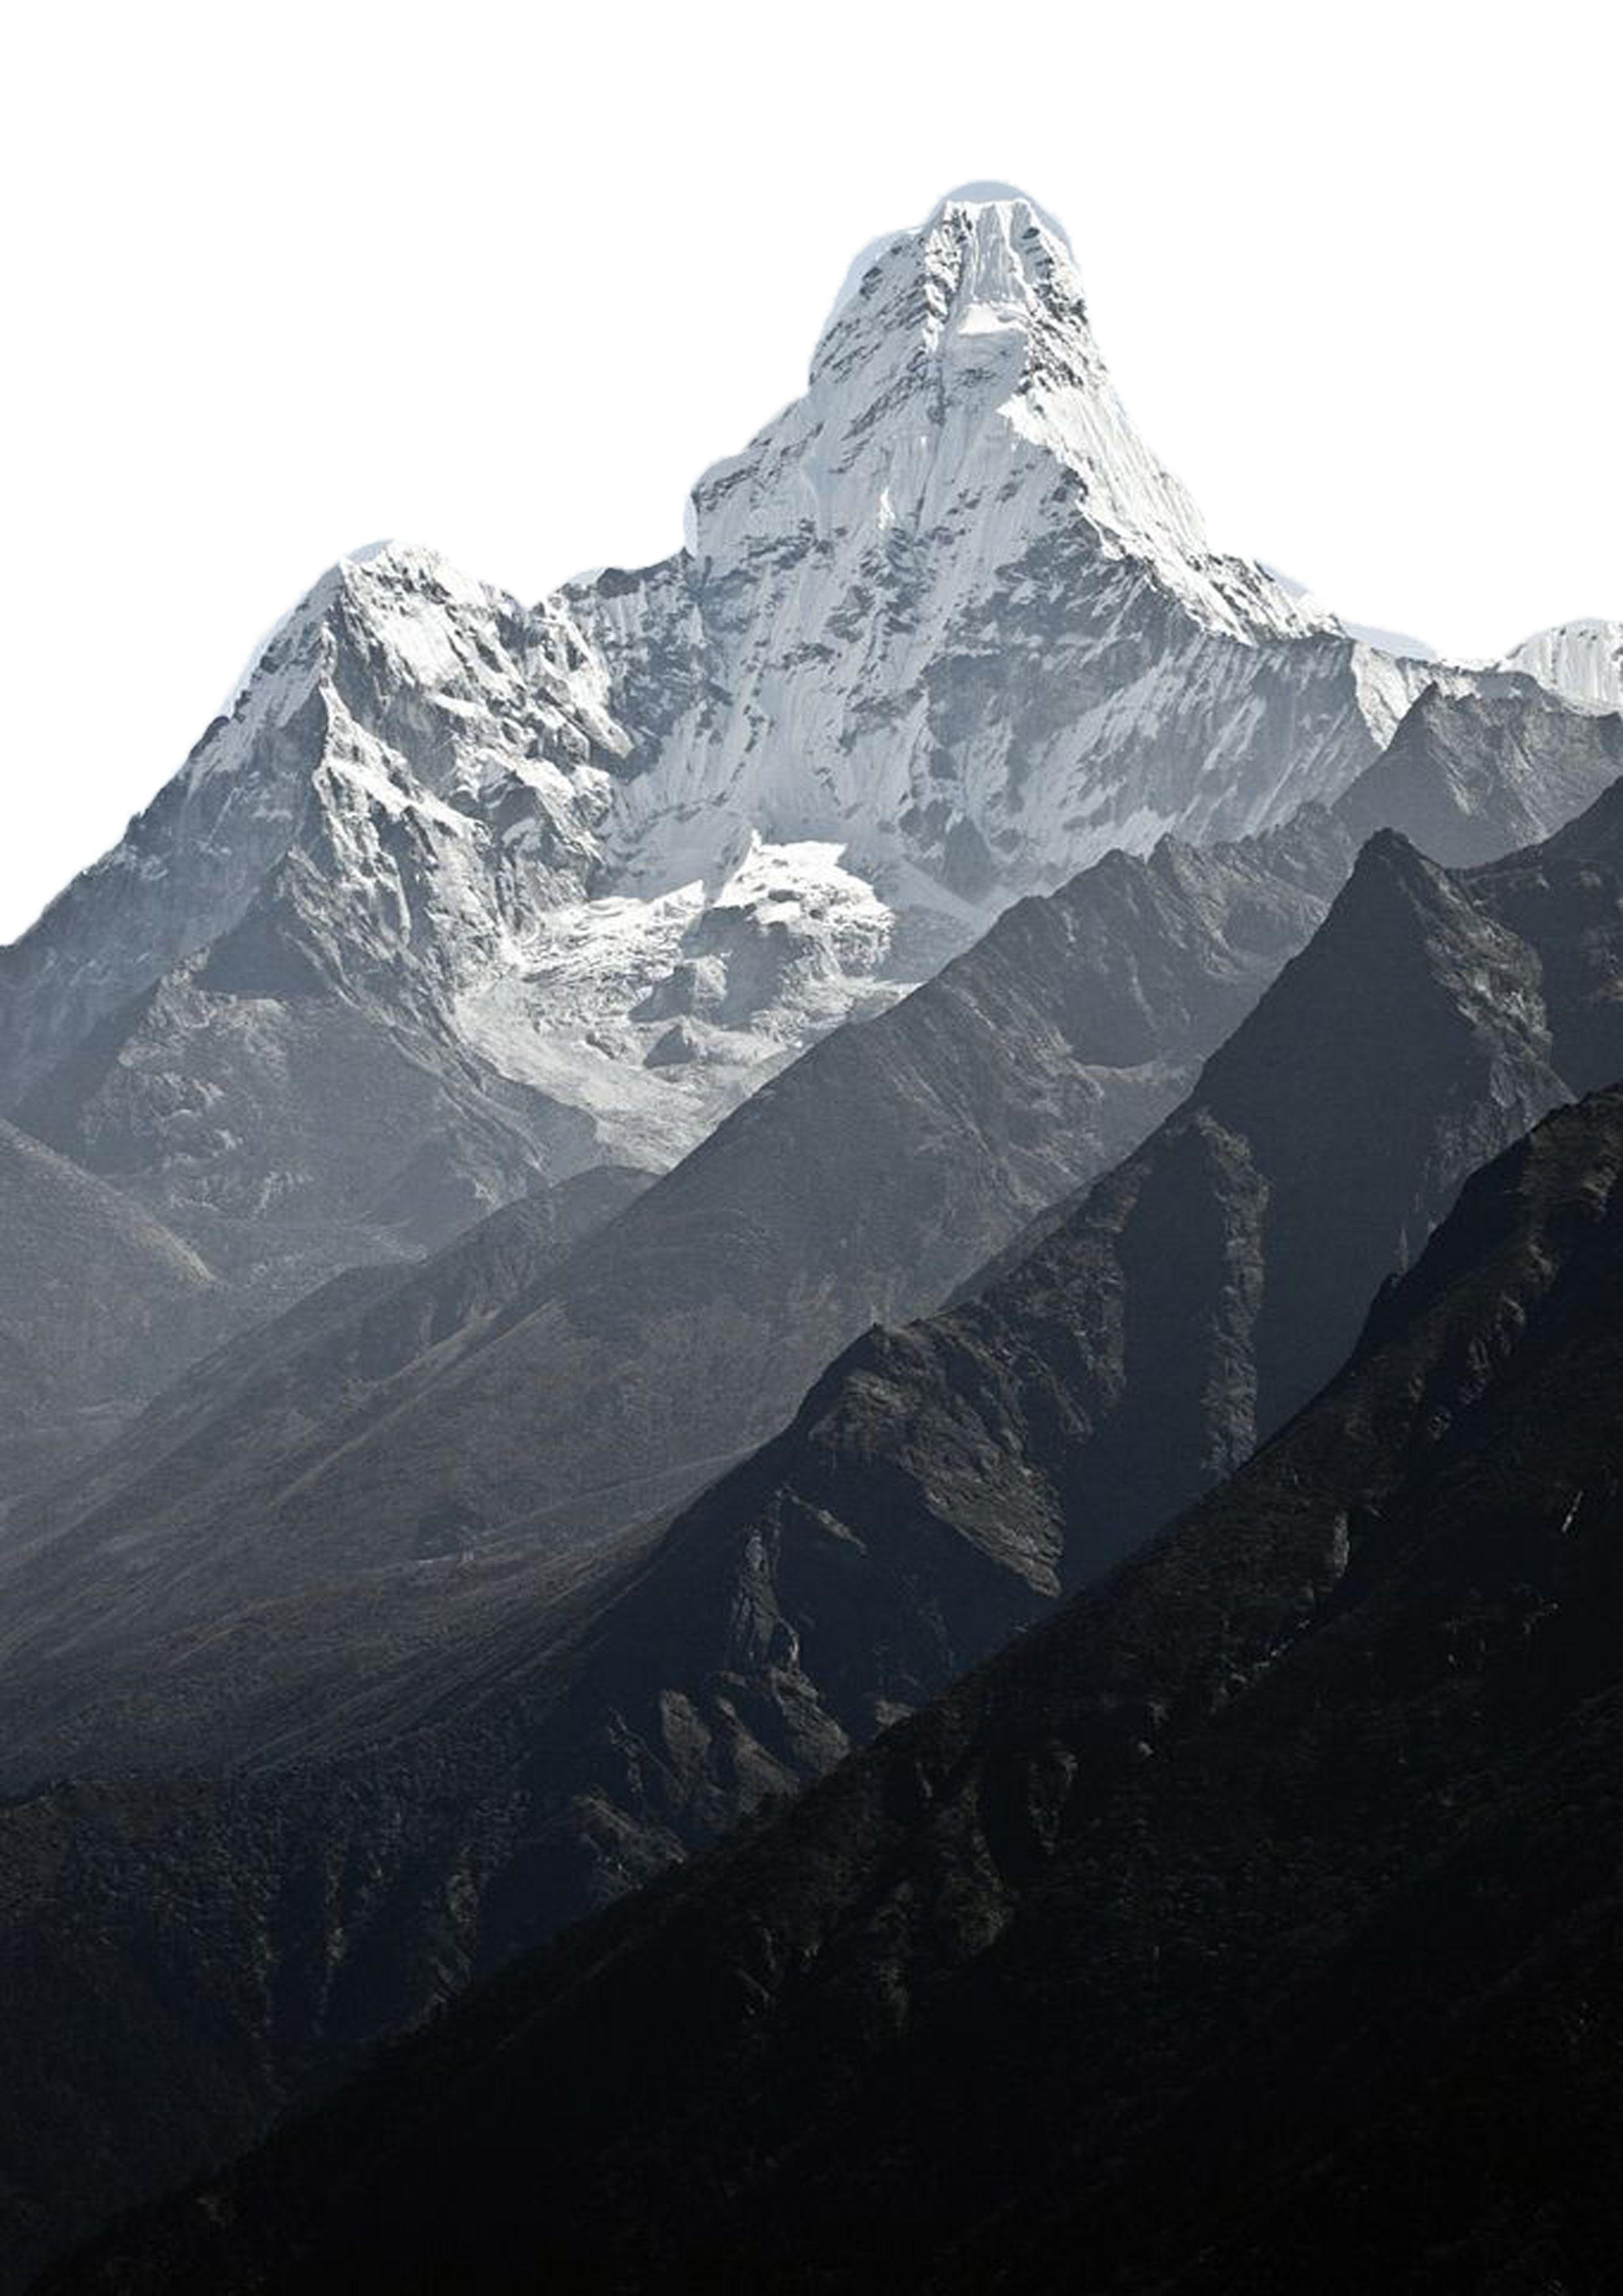 reputable site 55aef c1503 Denis Messie   Himalayas Aesthetic Light, Black And White Aesthetic,  Aesthetic Black, Black